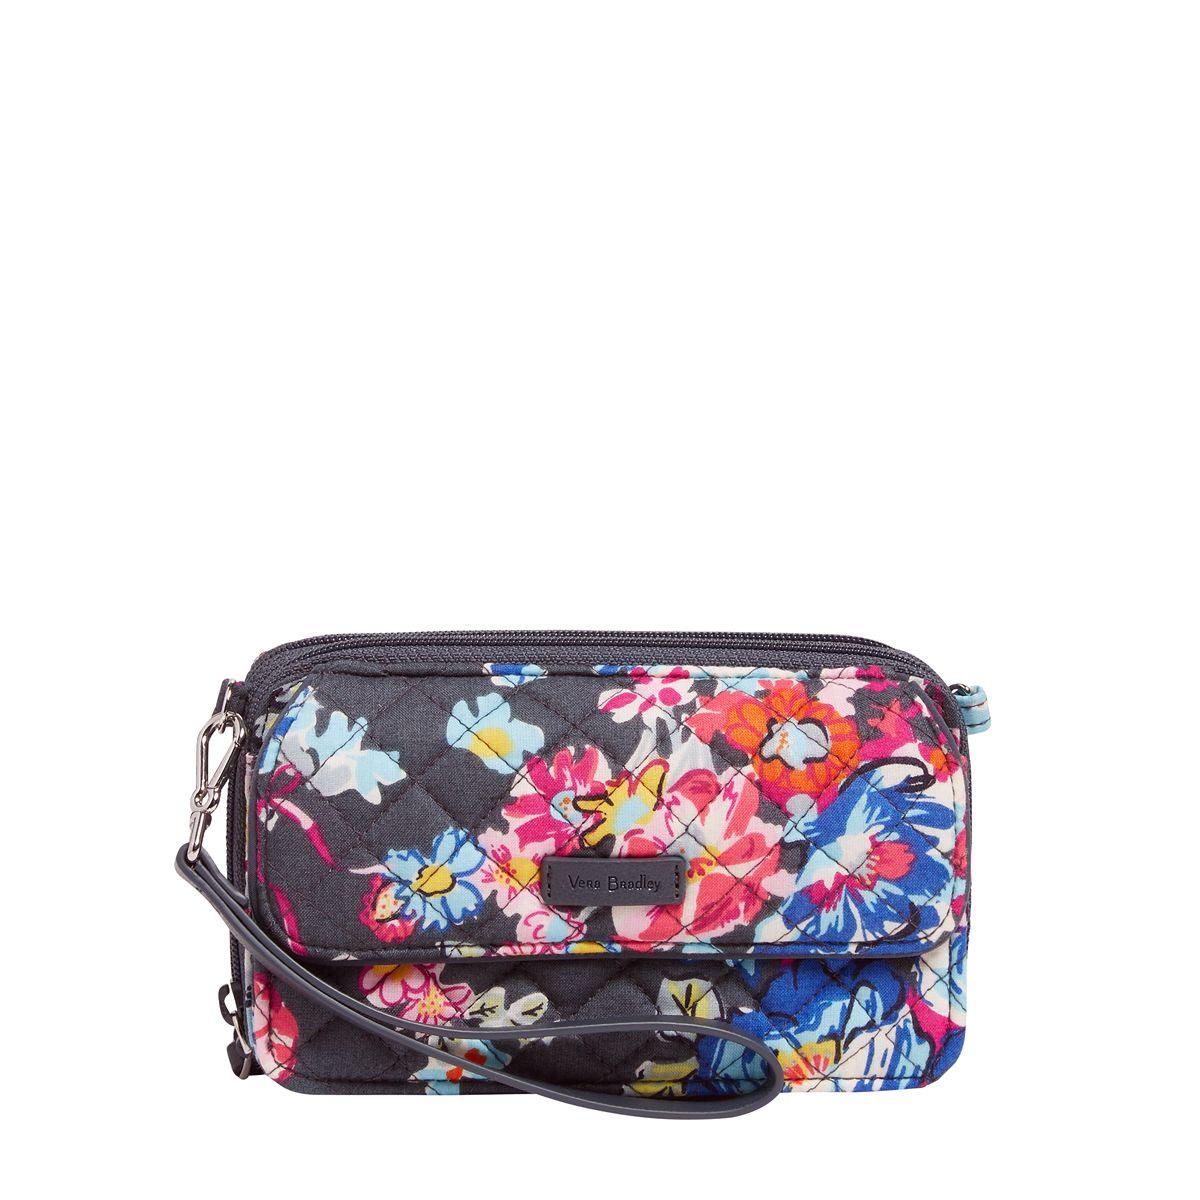 4778418a0e Vera Bradley Handbags - Macy s